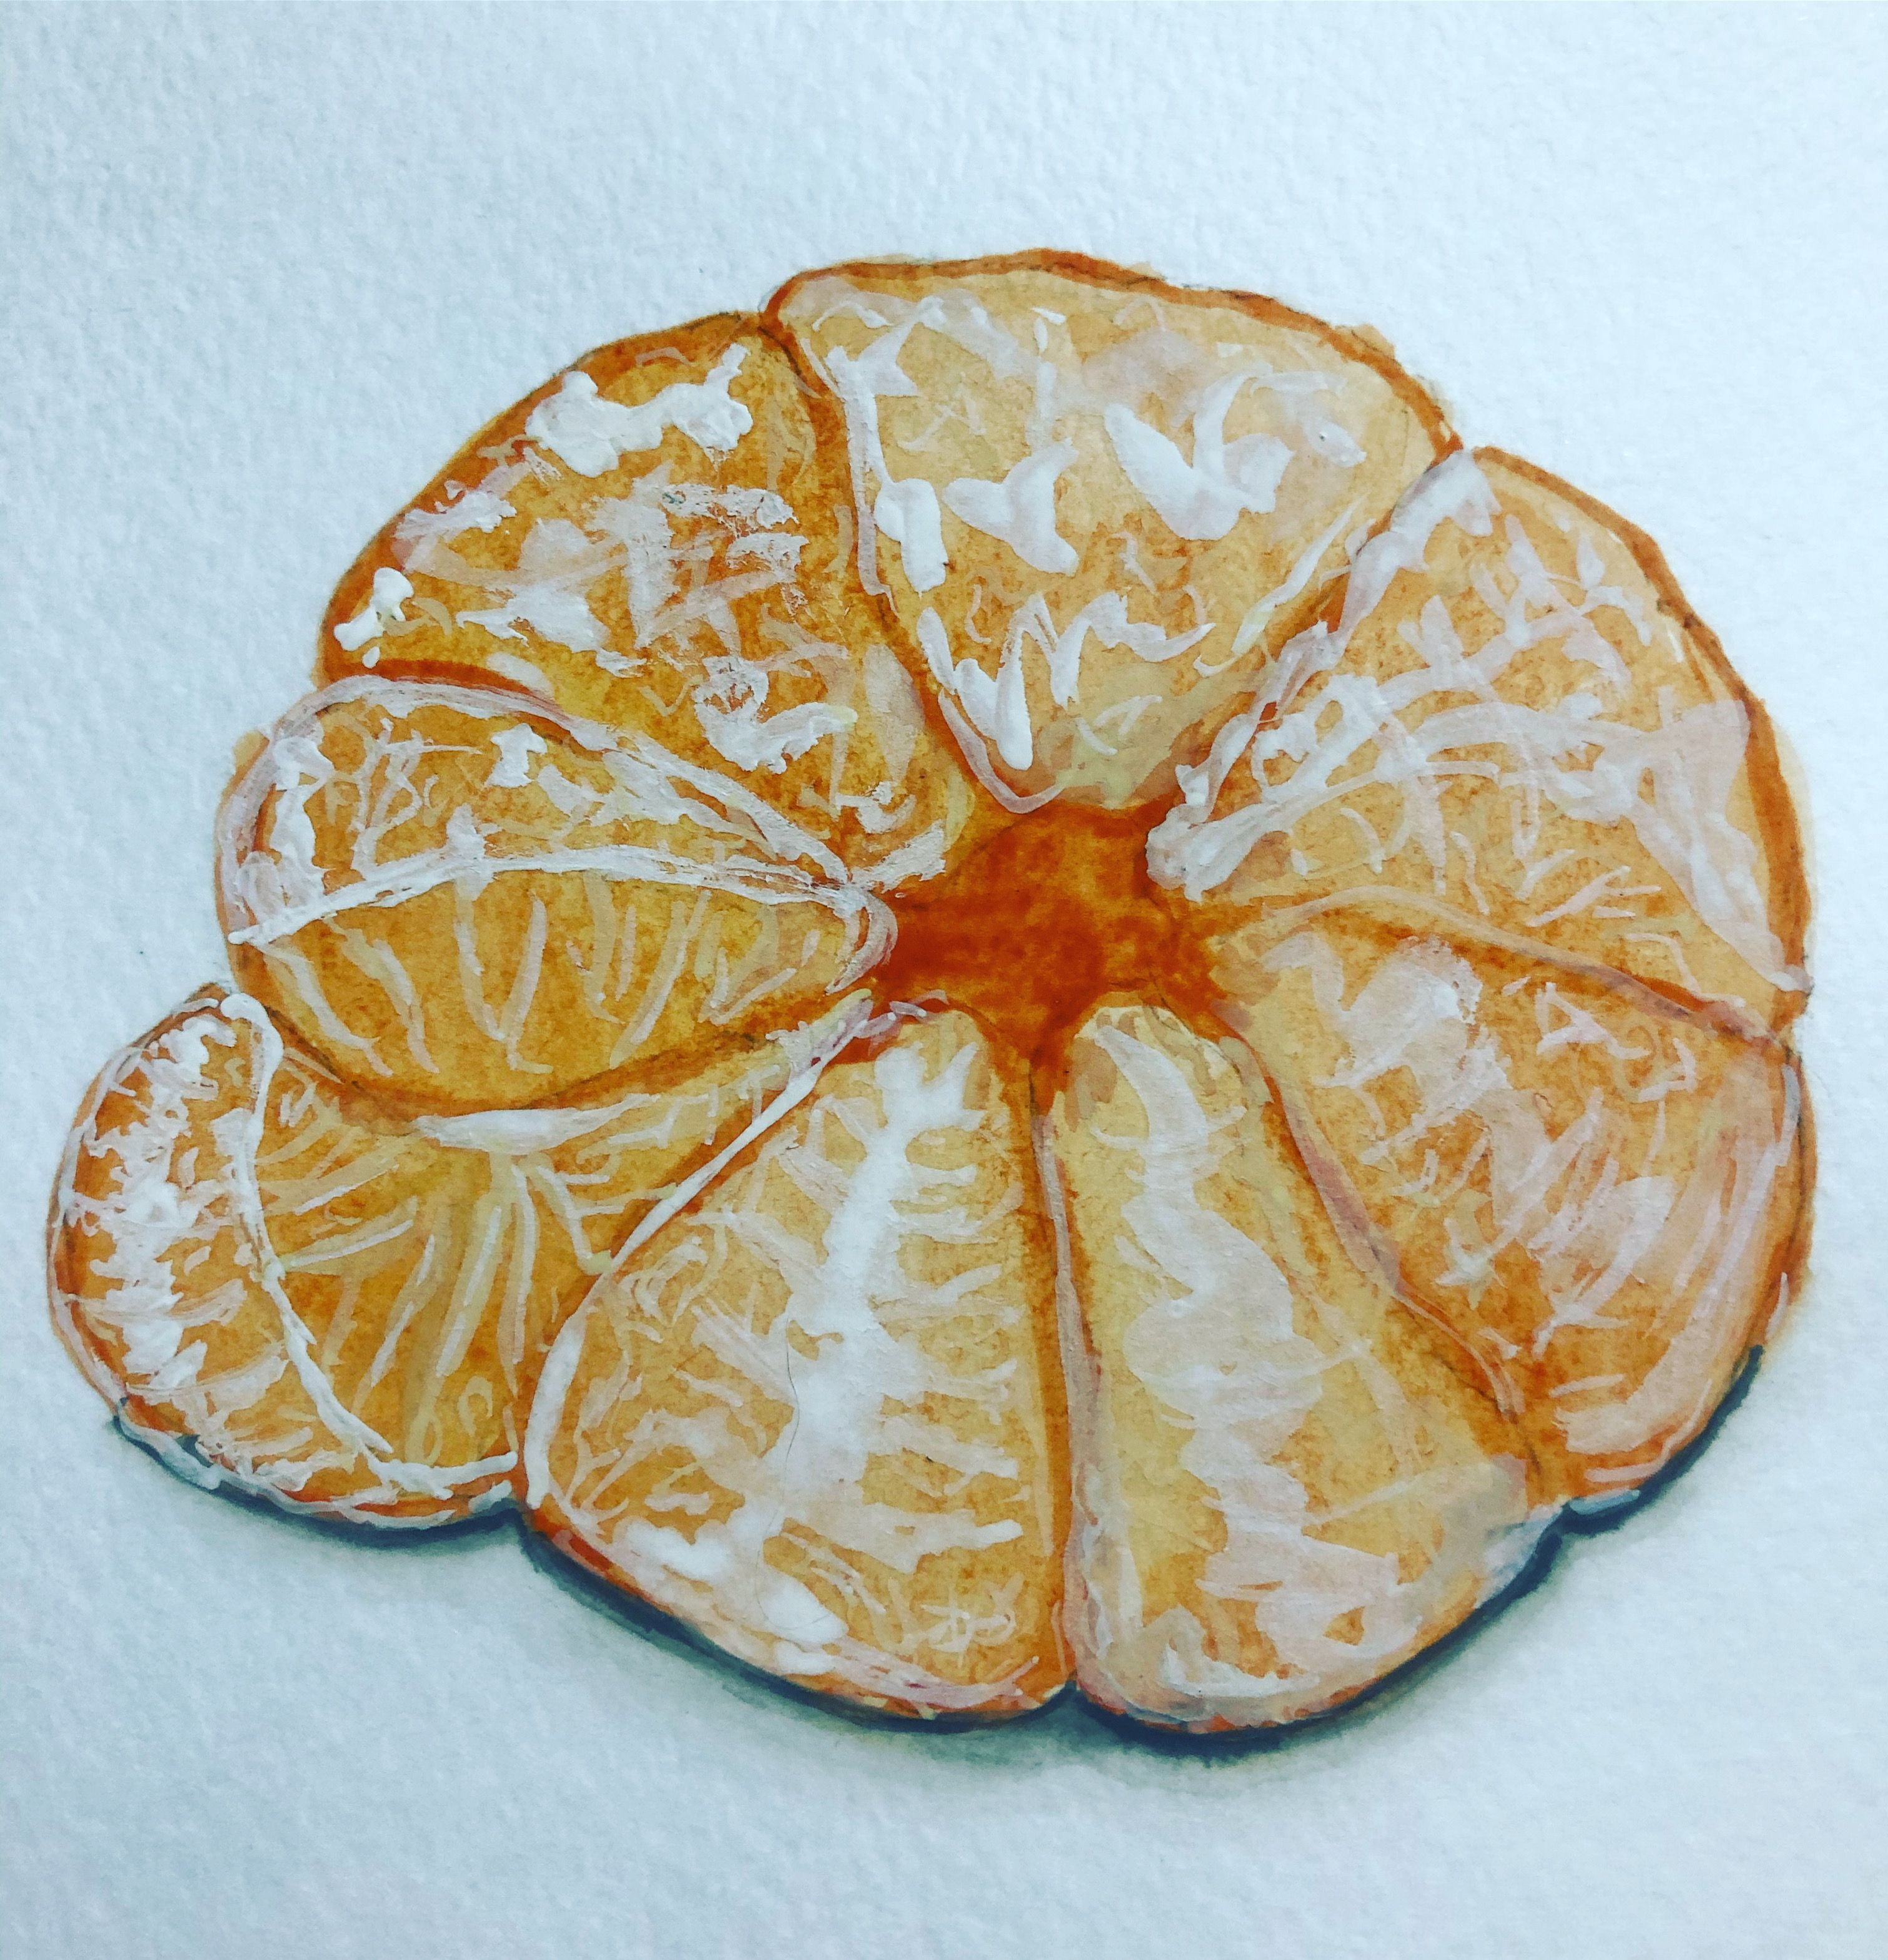 #watercolor #watercolorillustration #paint #акварель